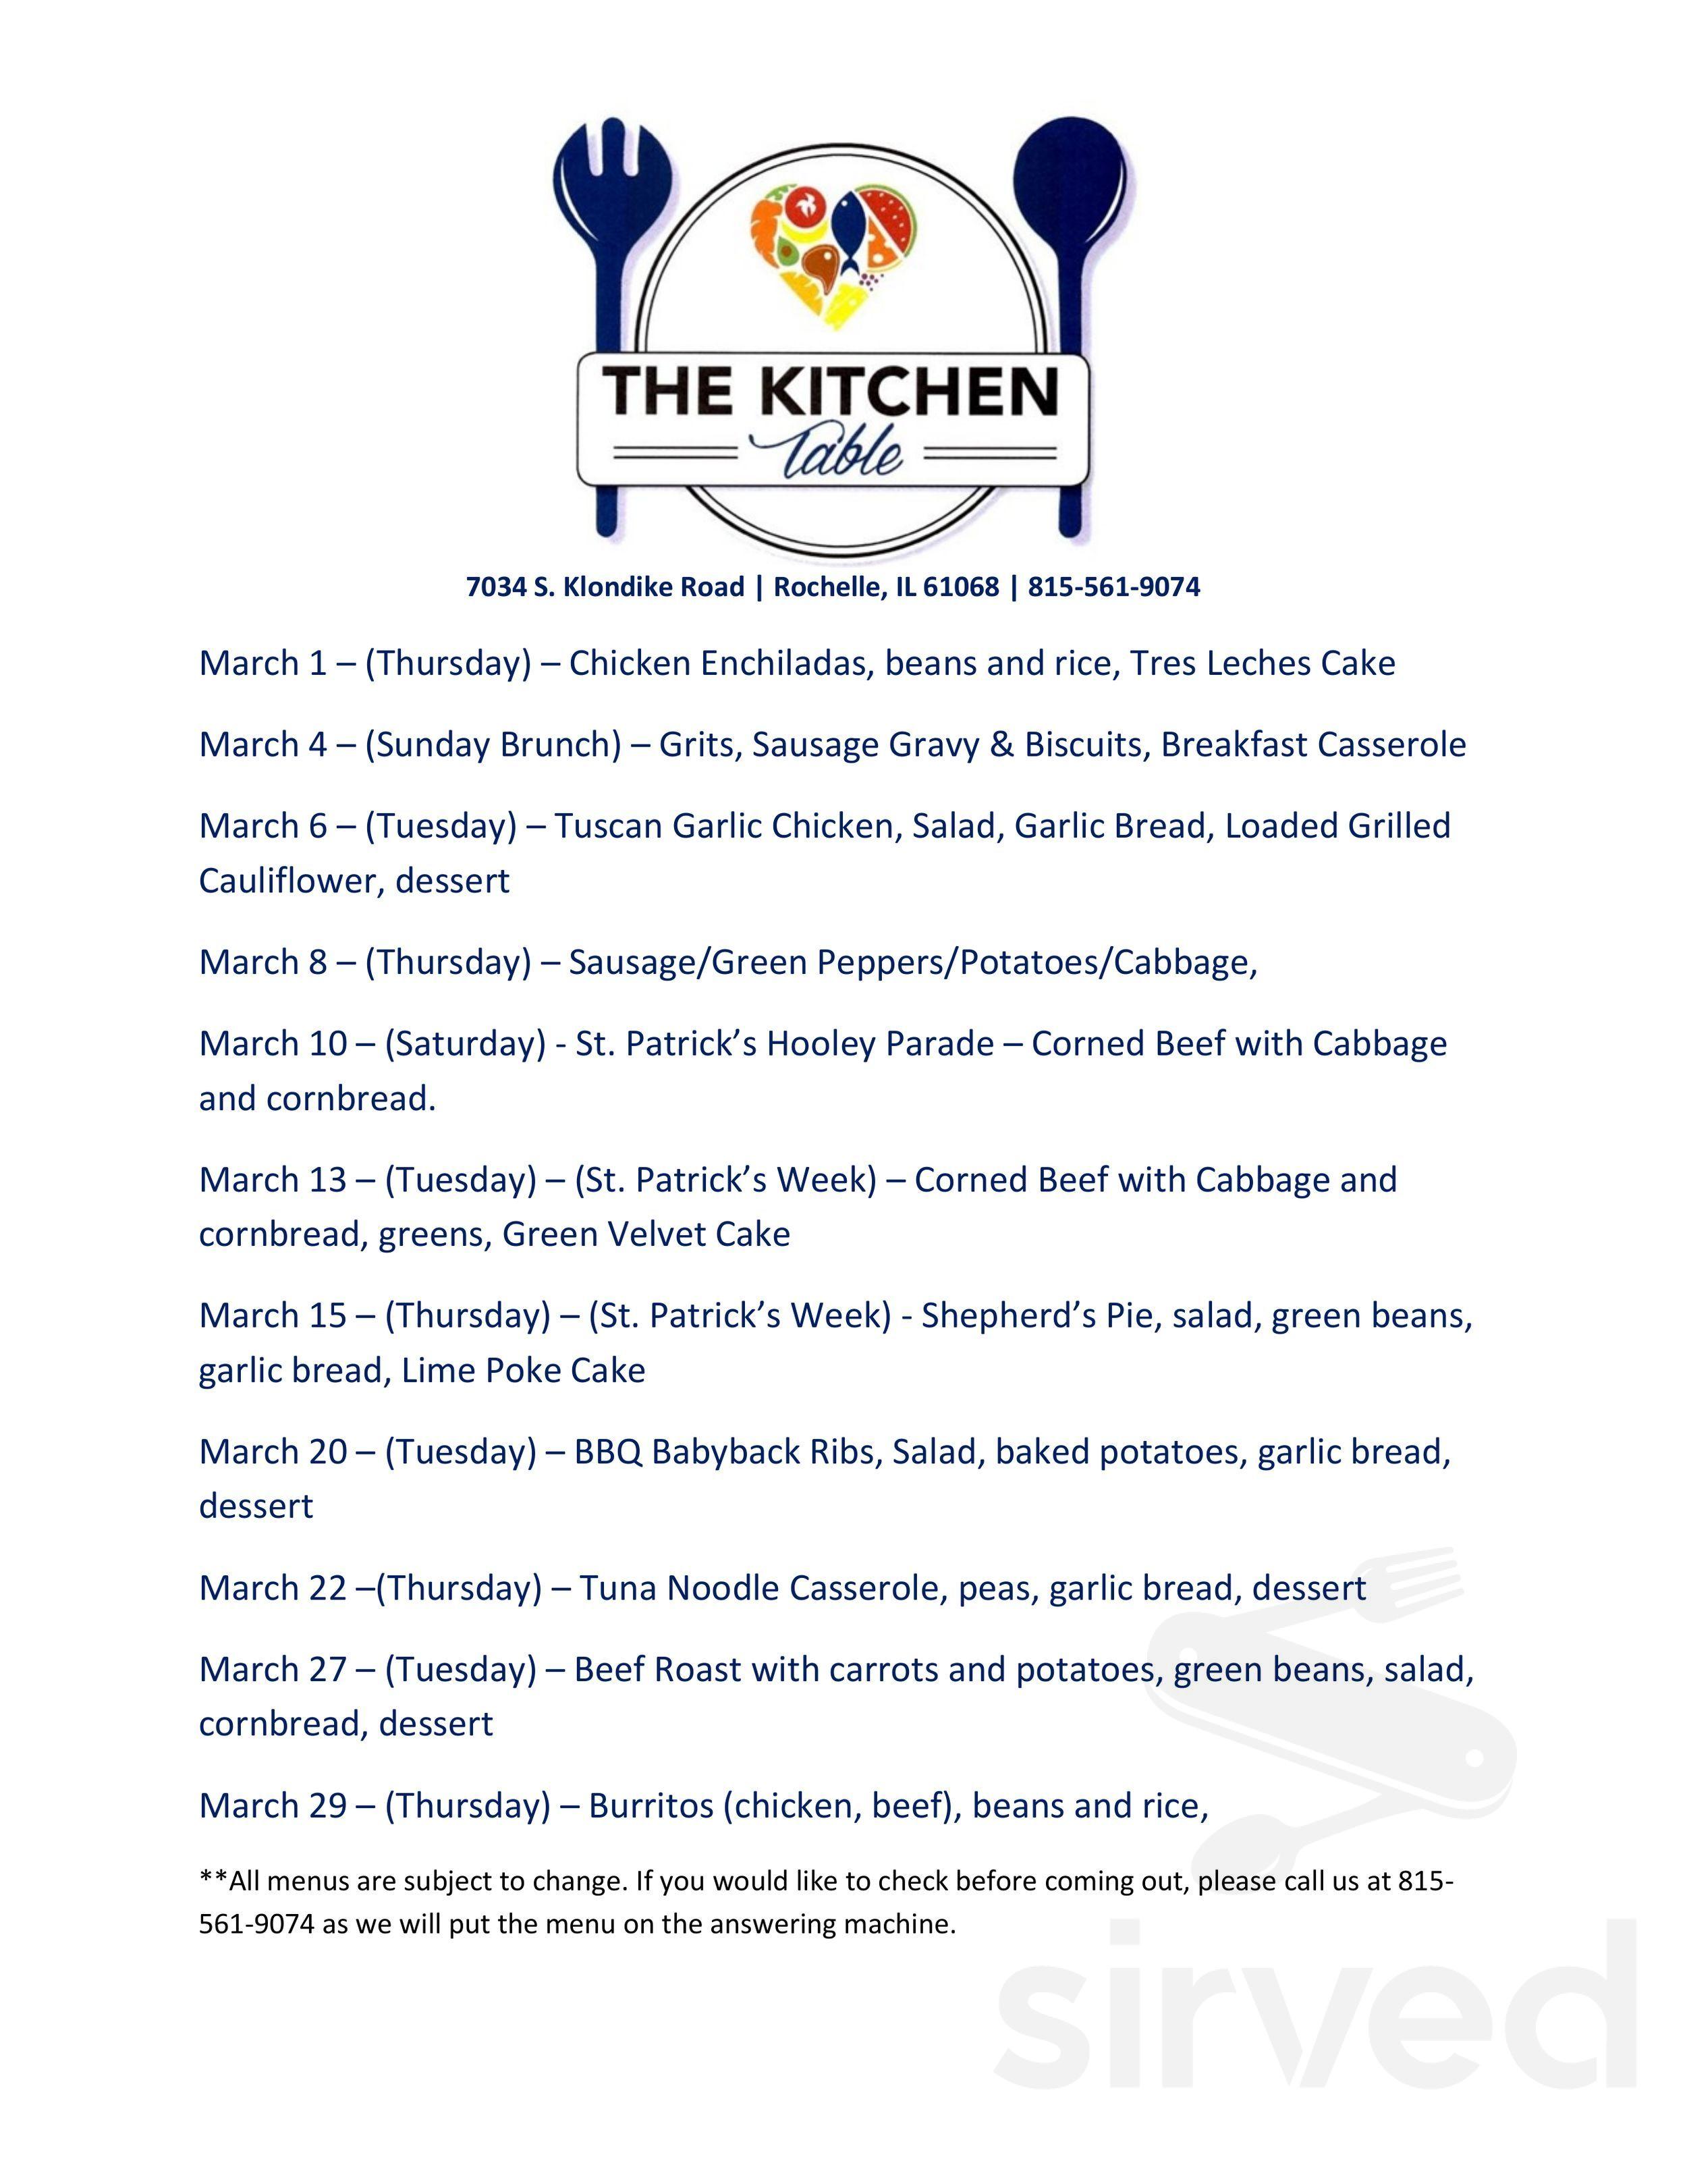 The Kitchen Table Inc Menu In Rochelle Illinois Usa